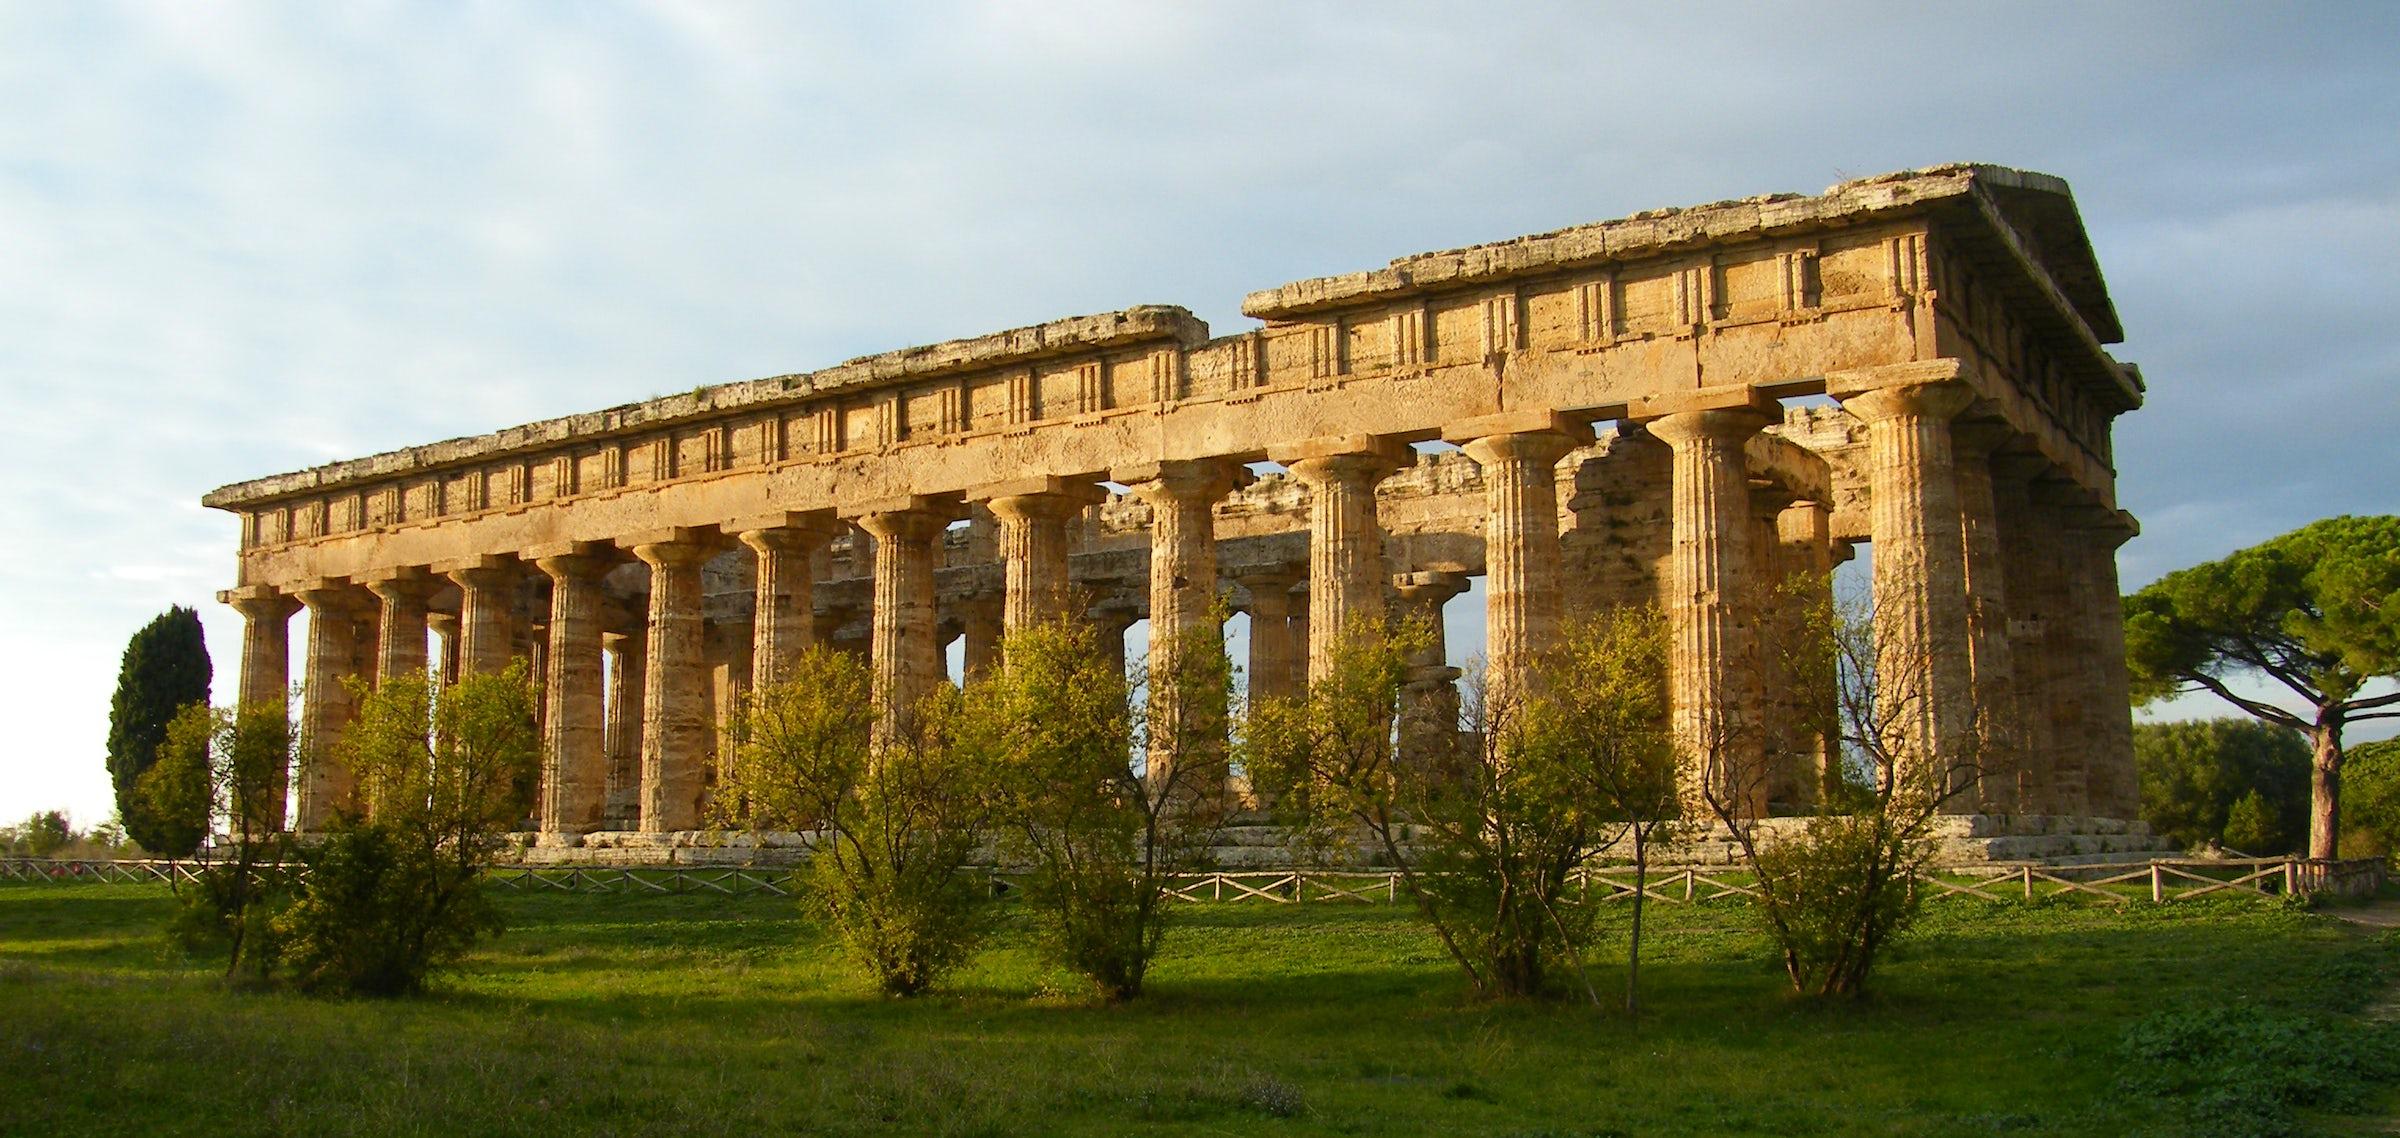 Come visit Paestum Archaeological Site